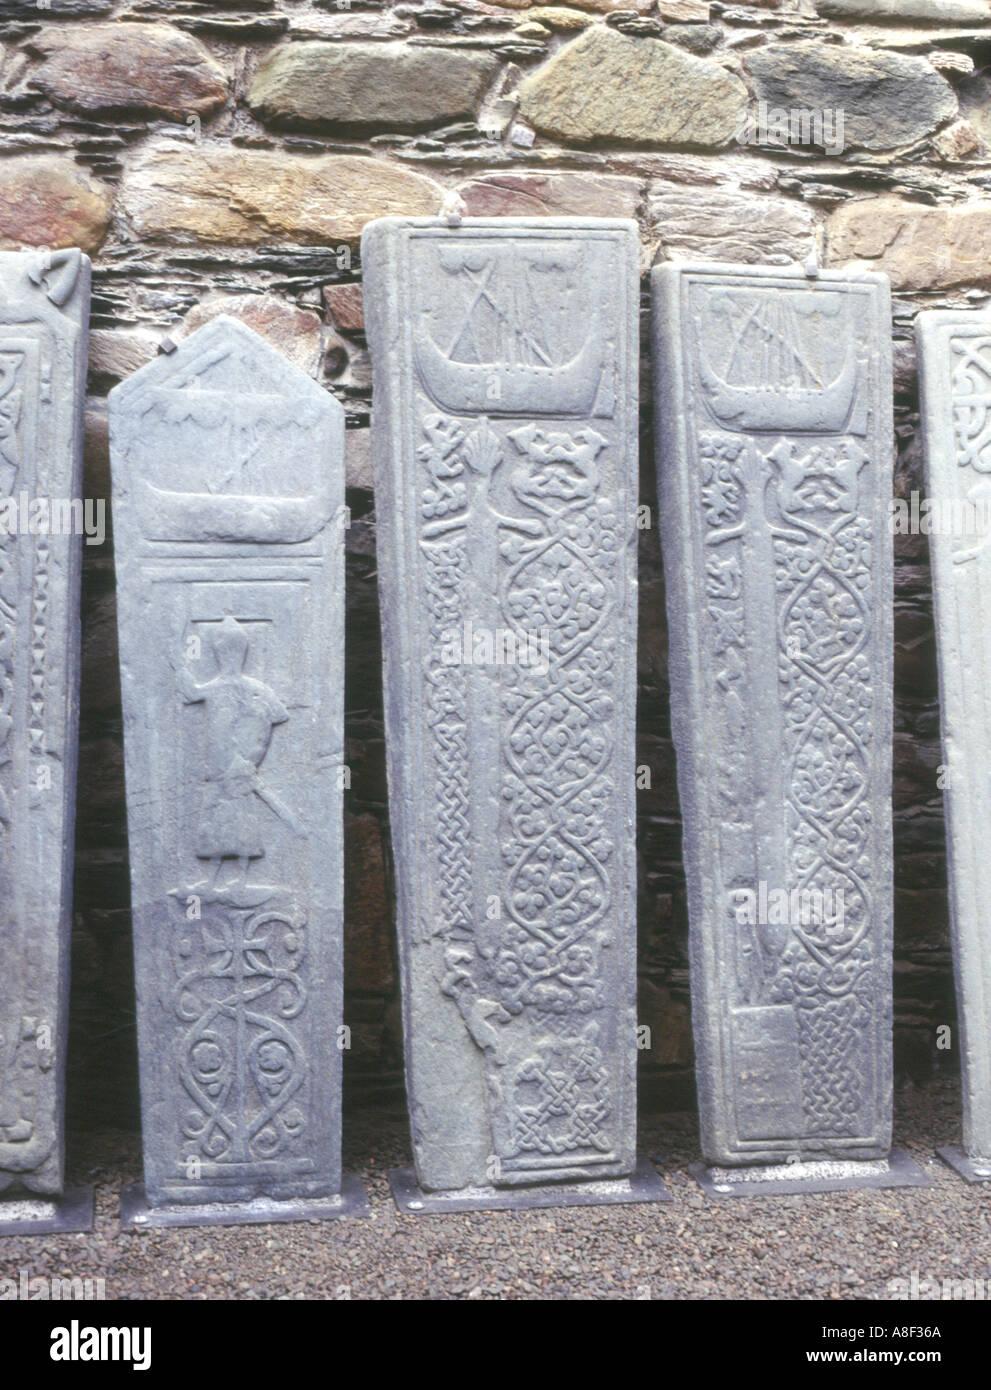 dh  KILMORY ARGYLL Sculptured gravestones carved stone grave slabs Stock Photo